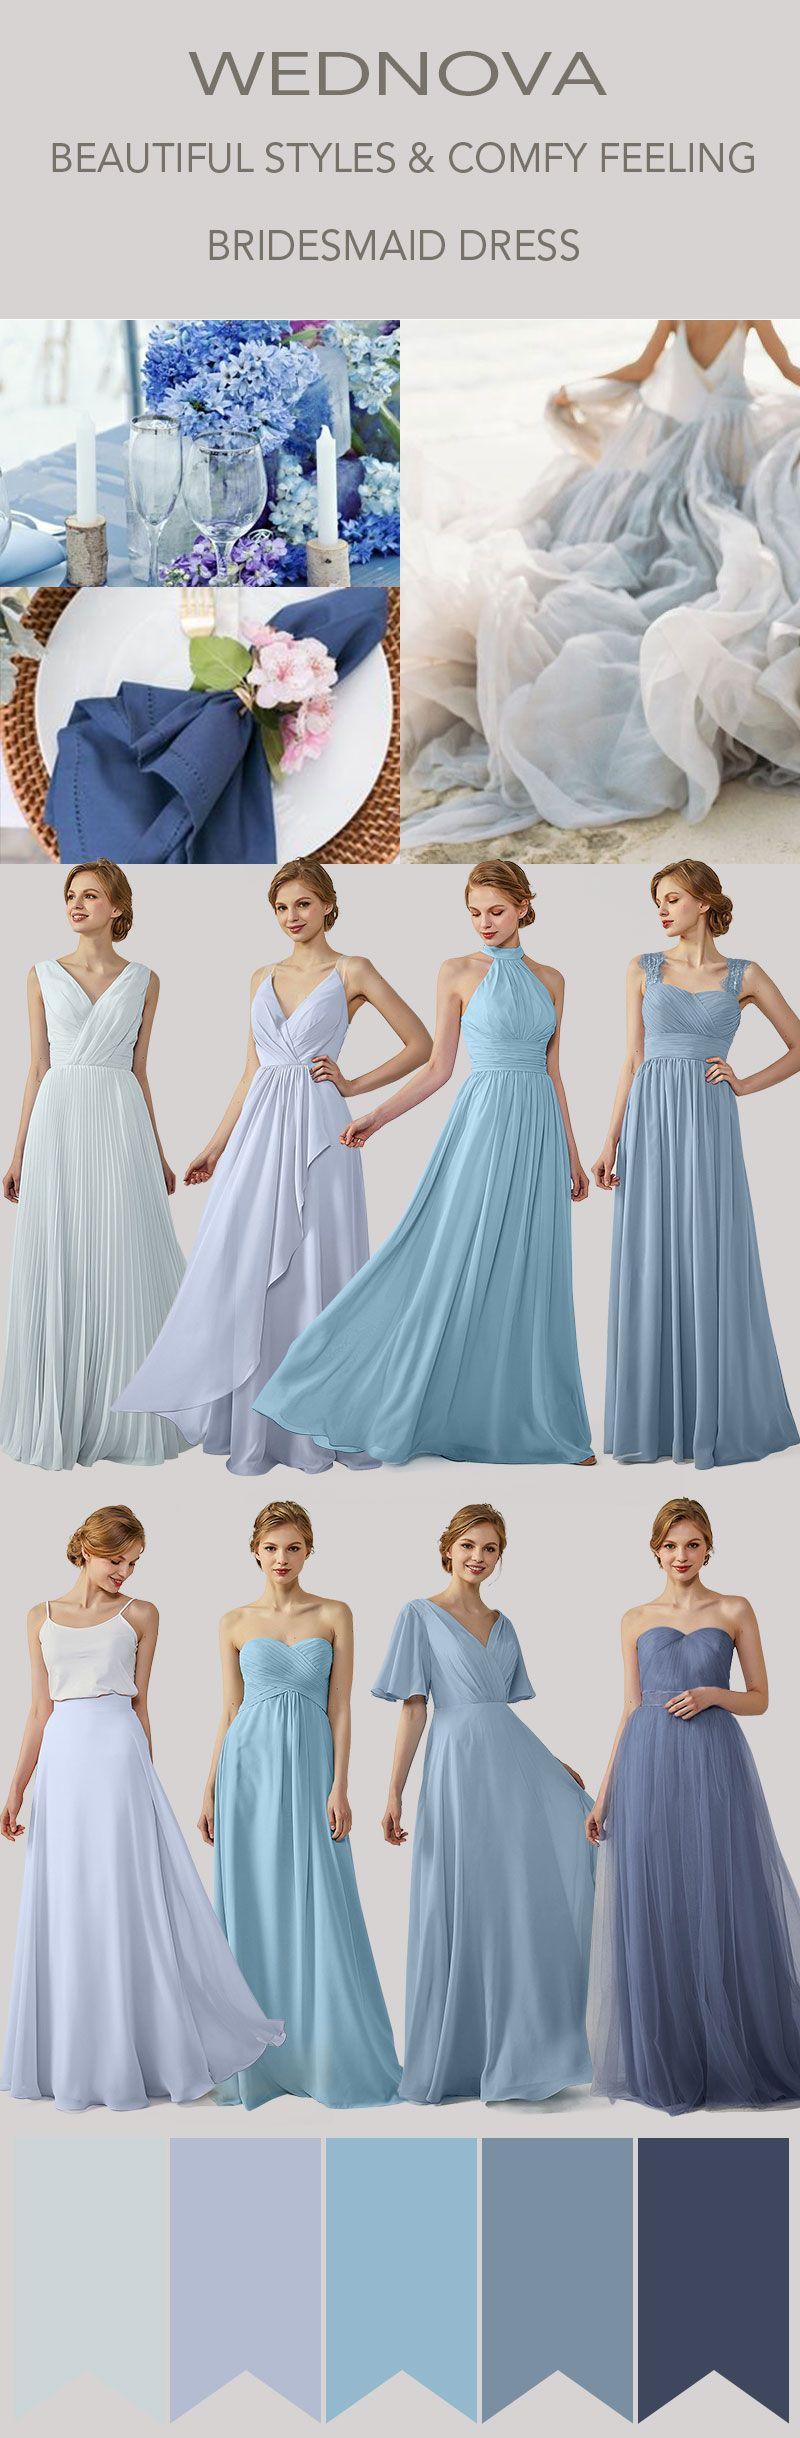 Straps bridesmaid dress ombre blue boho dress chiffon high quality